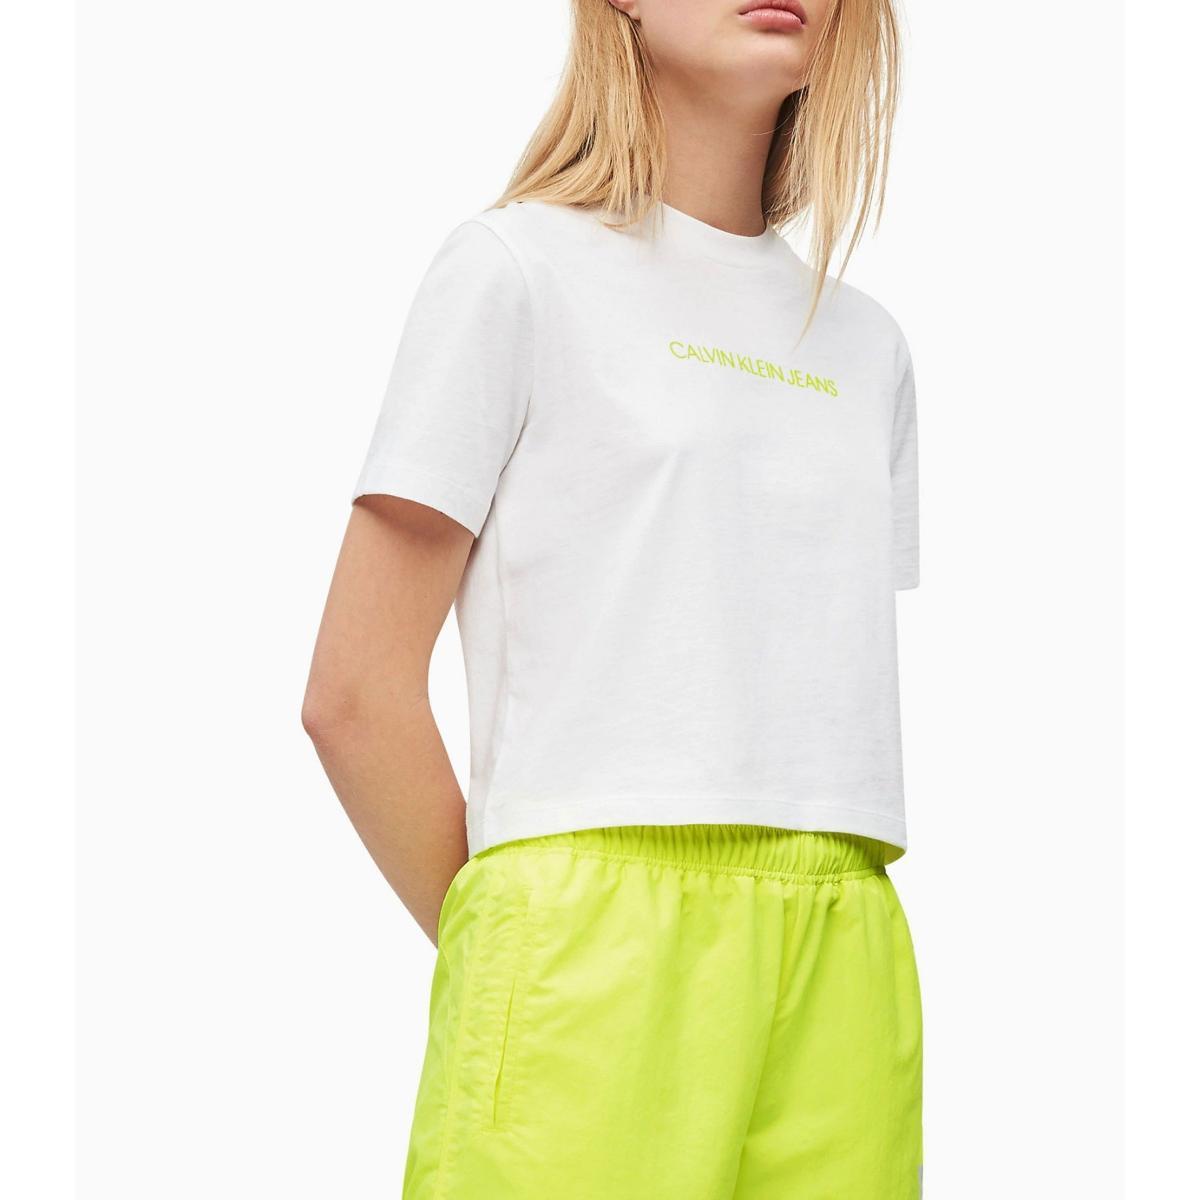 T-shirt Calvin Klein Jeans corta in cotone biologico da donna rif. J20J211495